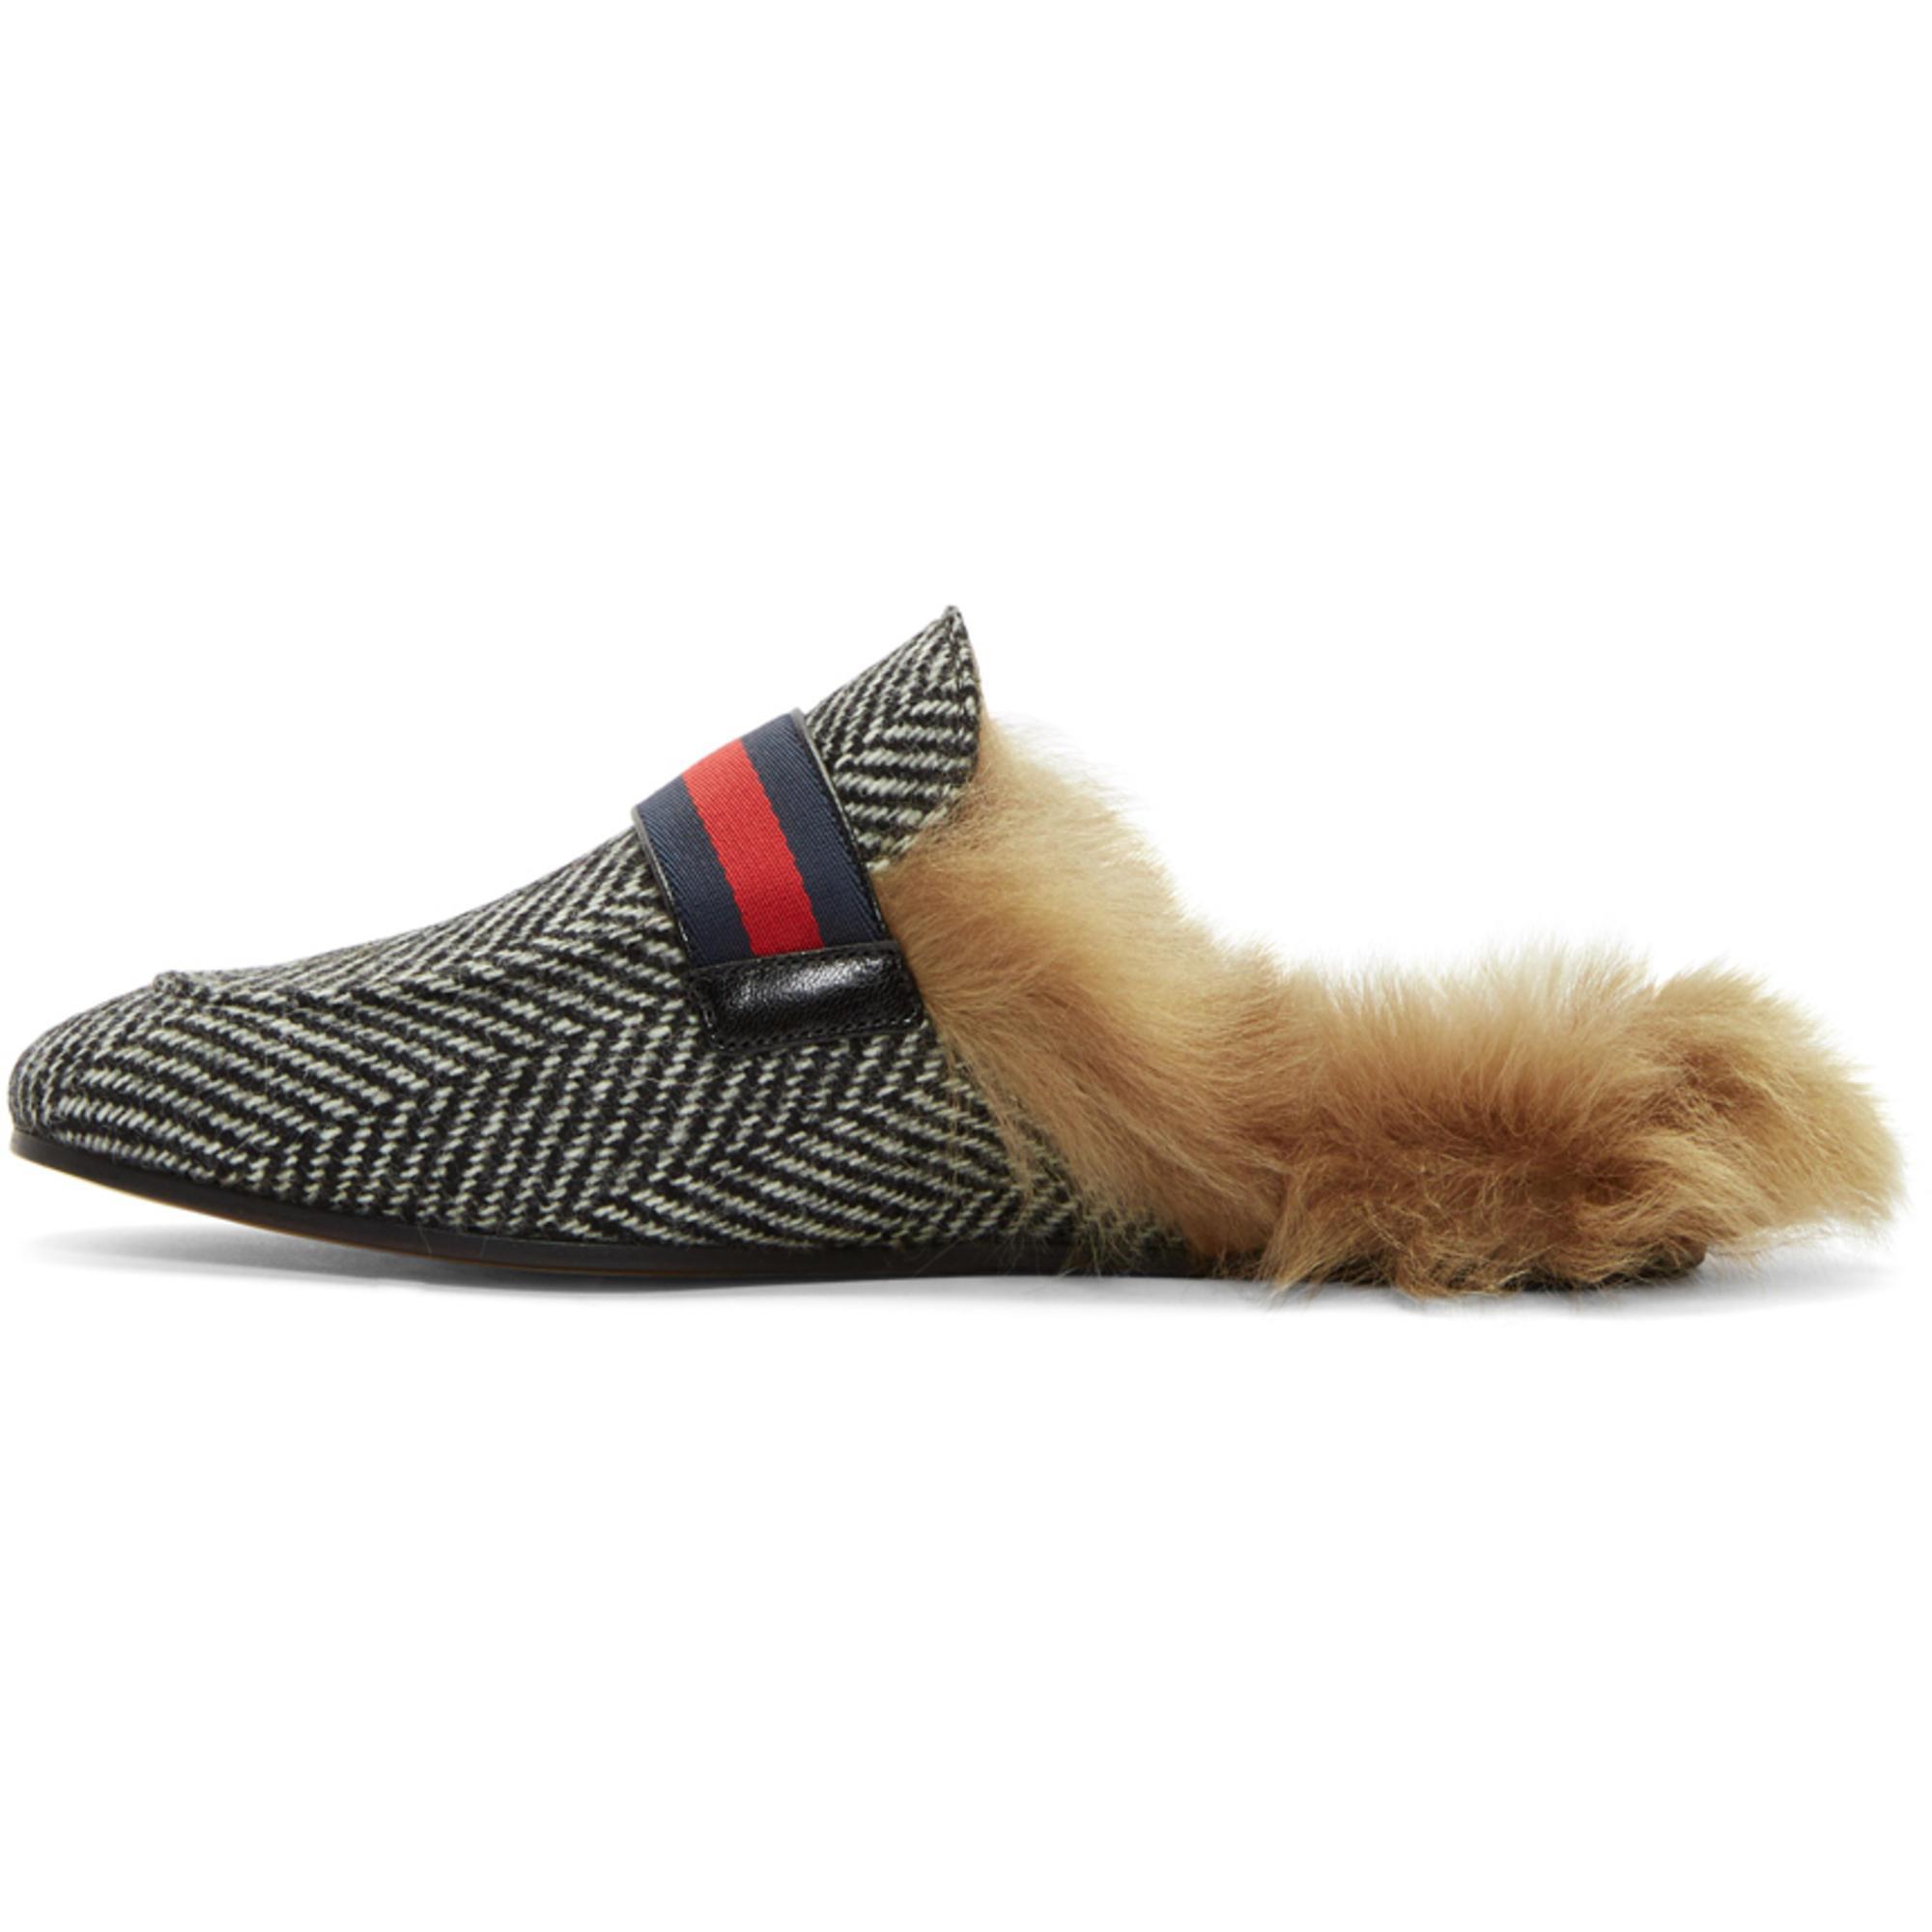 58d7cd40c8e Lyst - Gucci Black And White Herringbone Wool-lined Princetown Slip ...